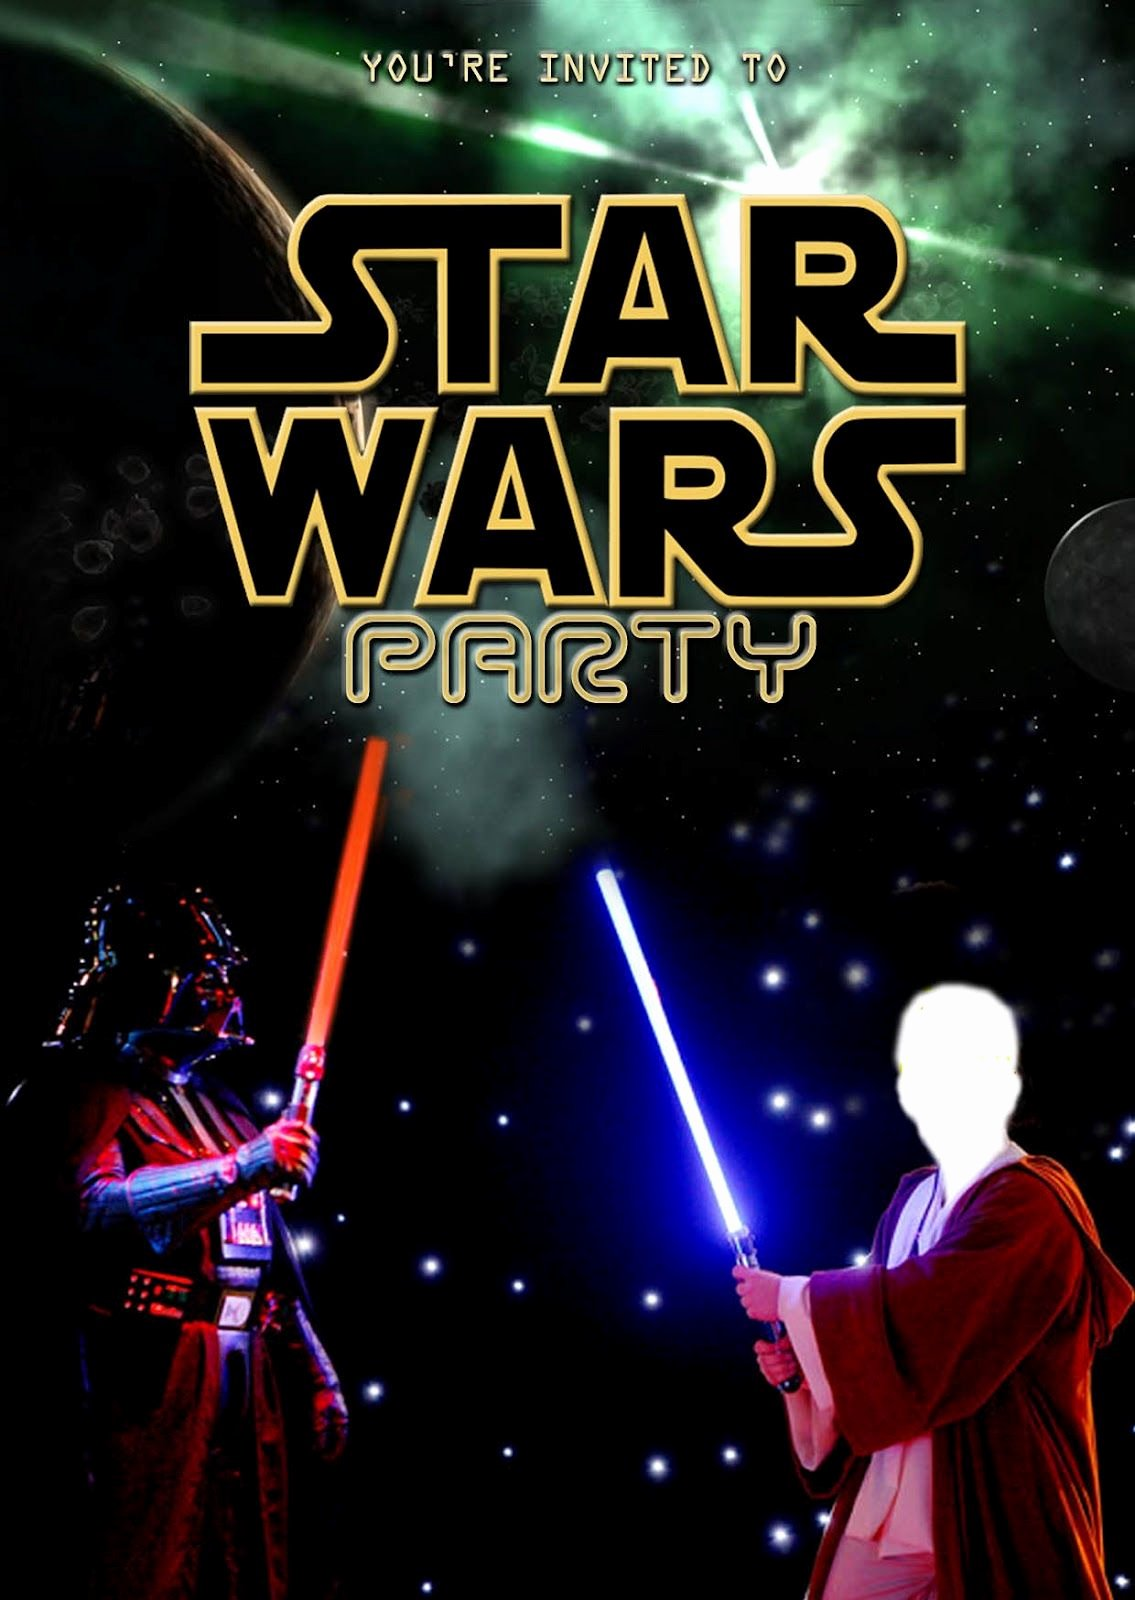 Star Wars Birthday Invite Awesome Free Kids Party Invitations Star Wars Party Invitation New Boy Birthday Parties